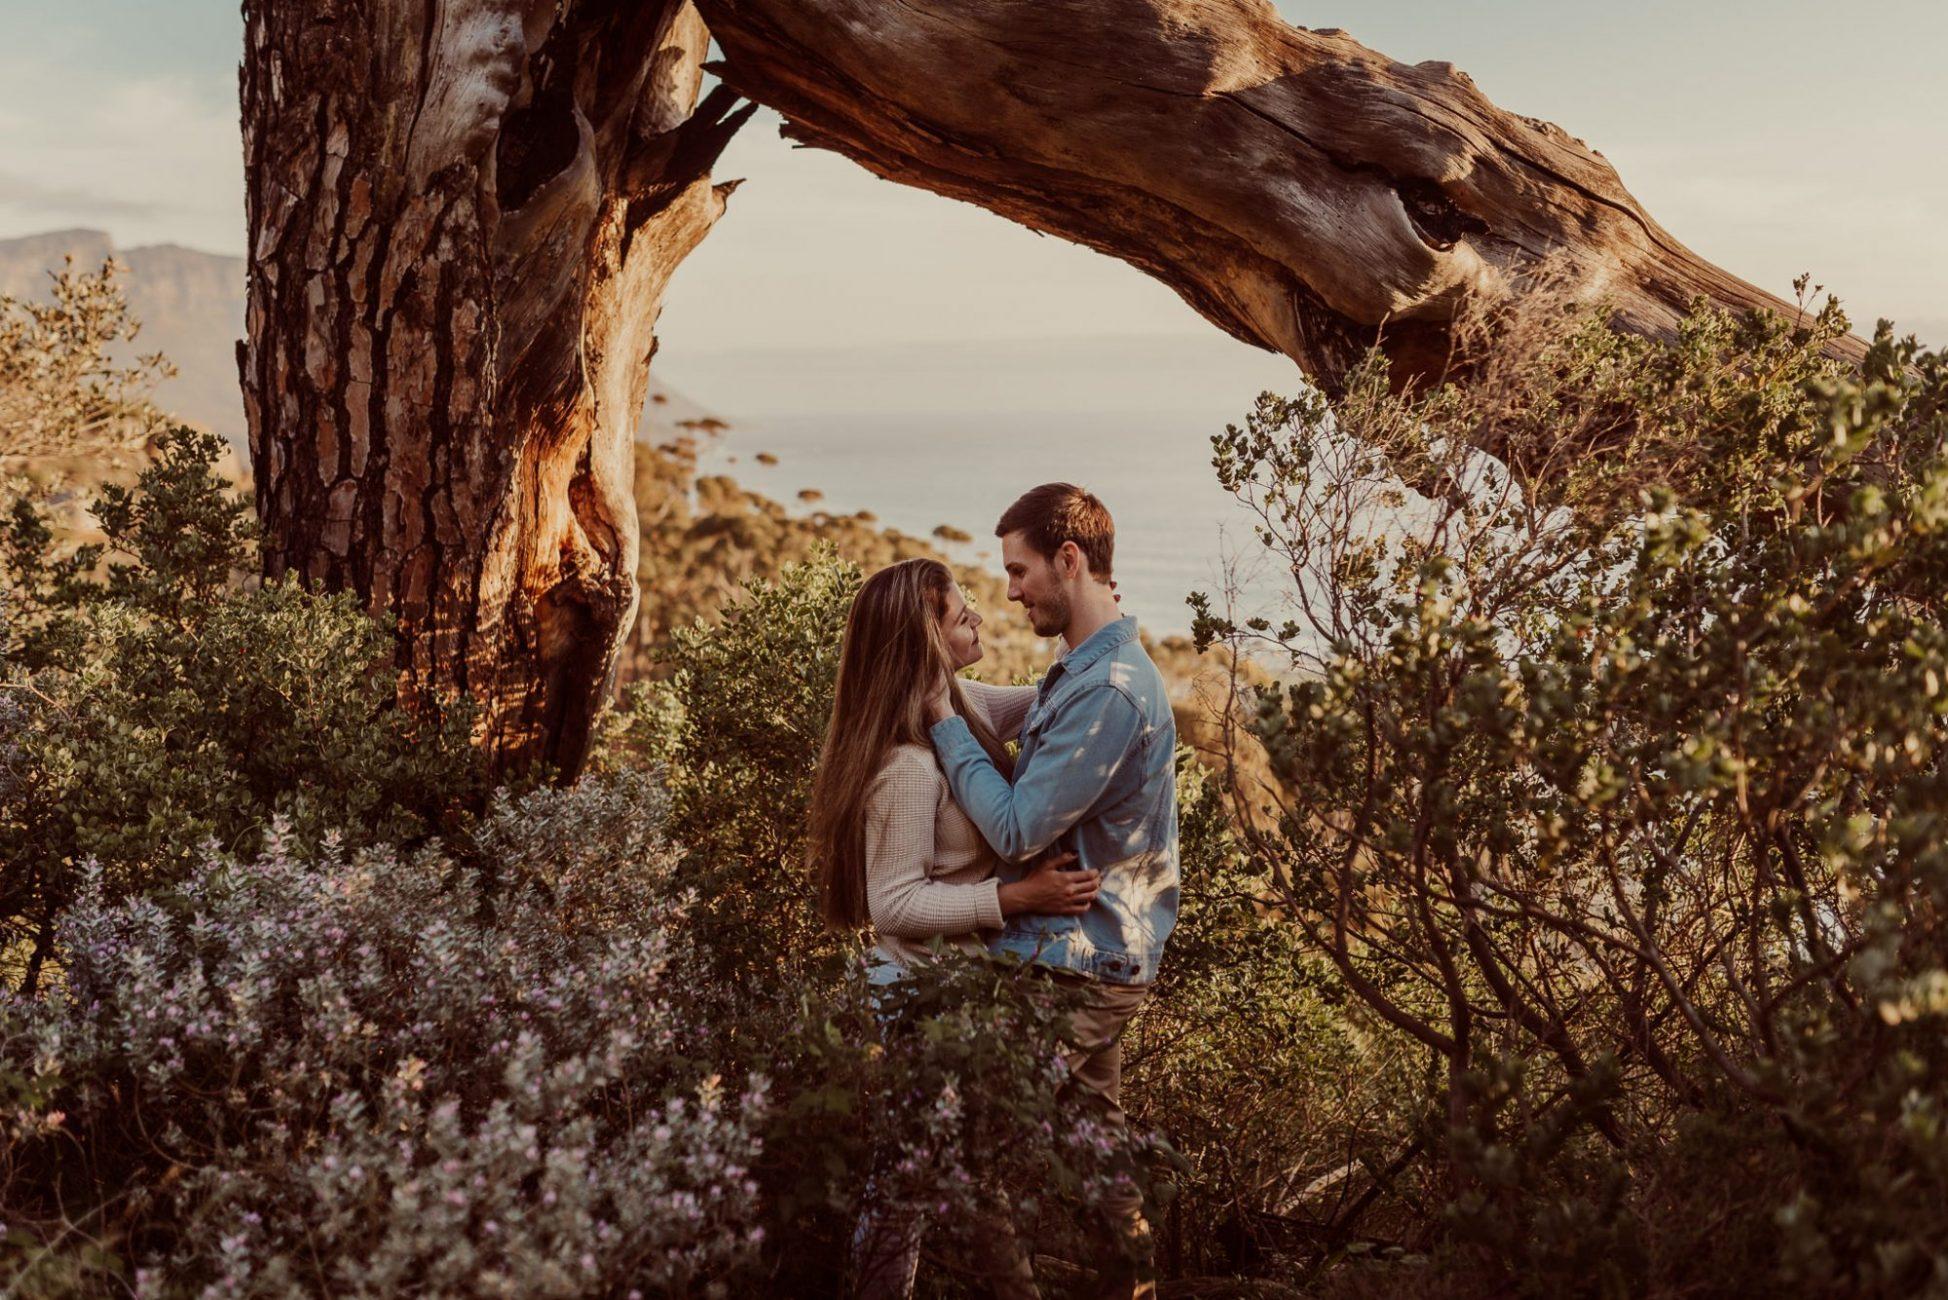 table_mountain_national_park_engagement_photoshoot_session_couple_flowers_nature_tree_romance_cr8tive_duo_shaun_sarka